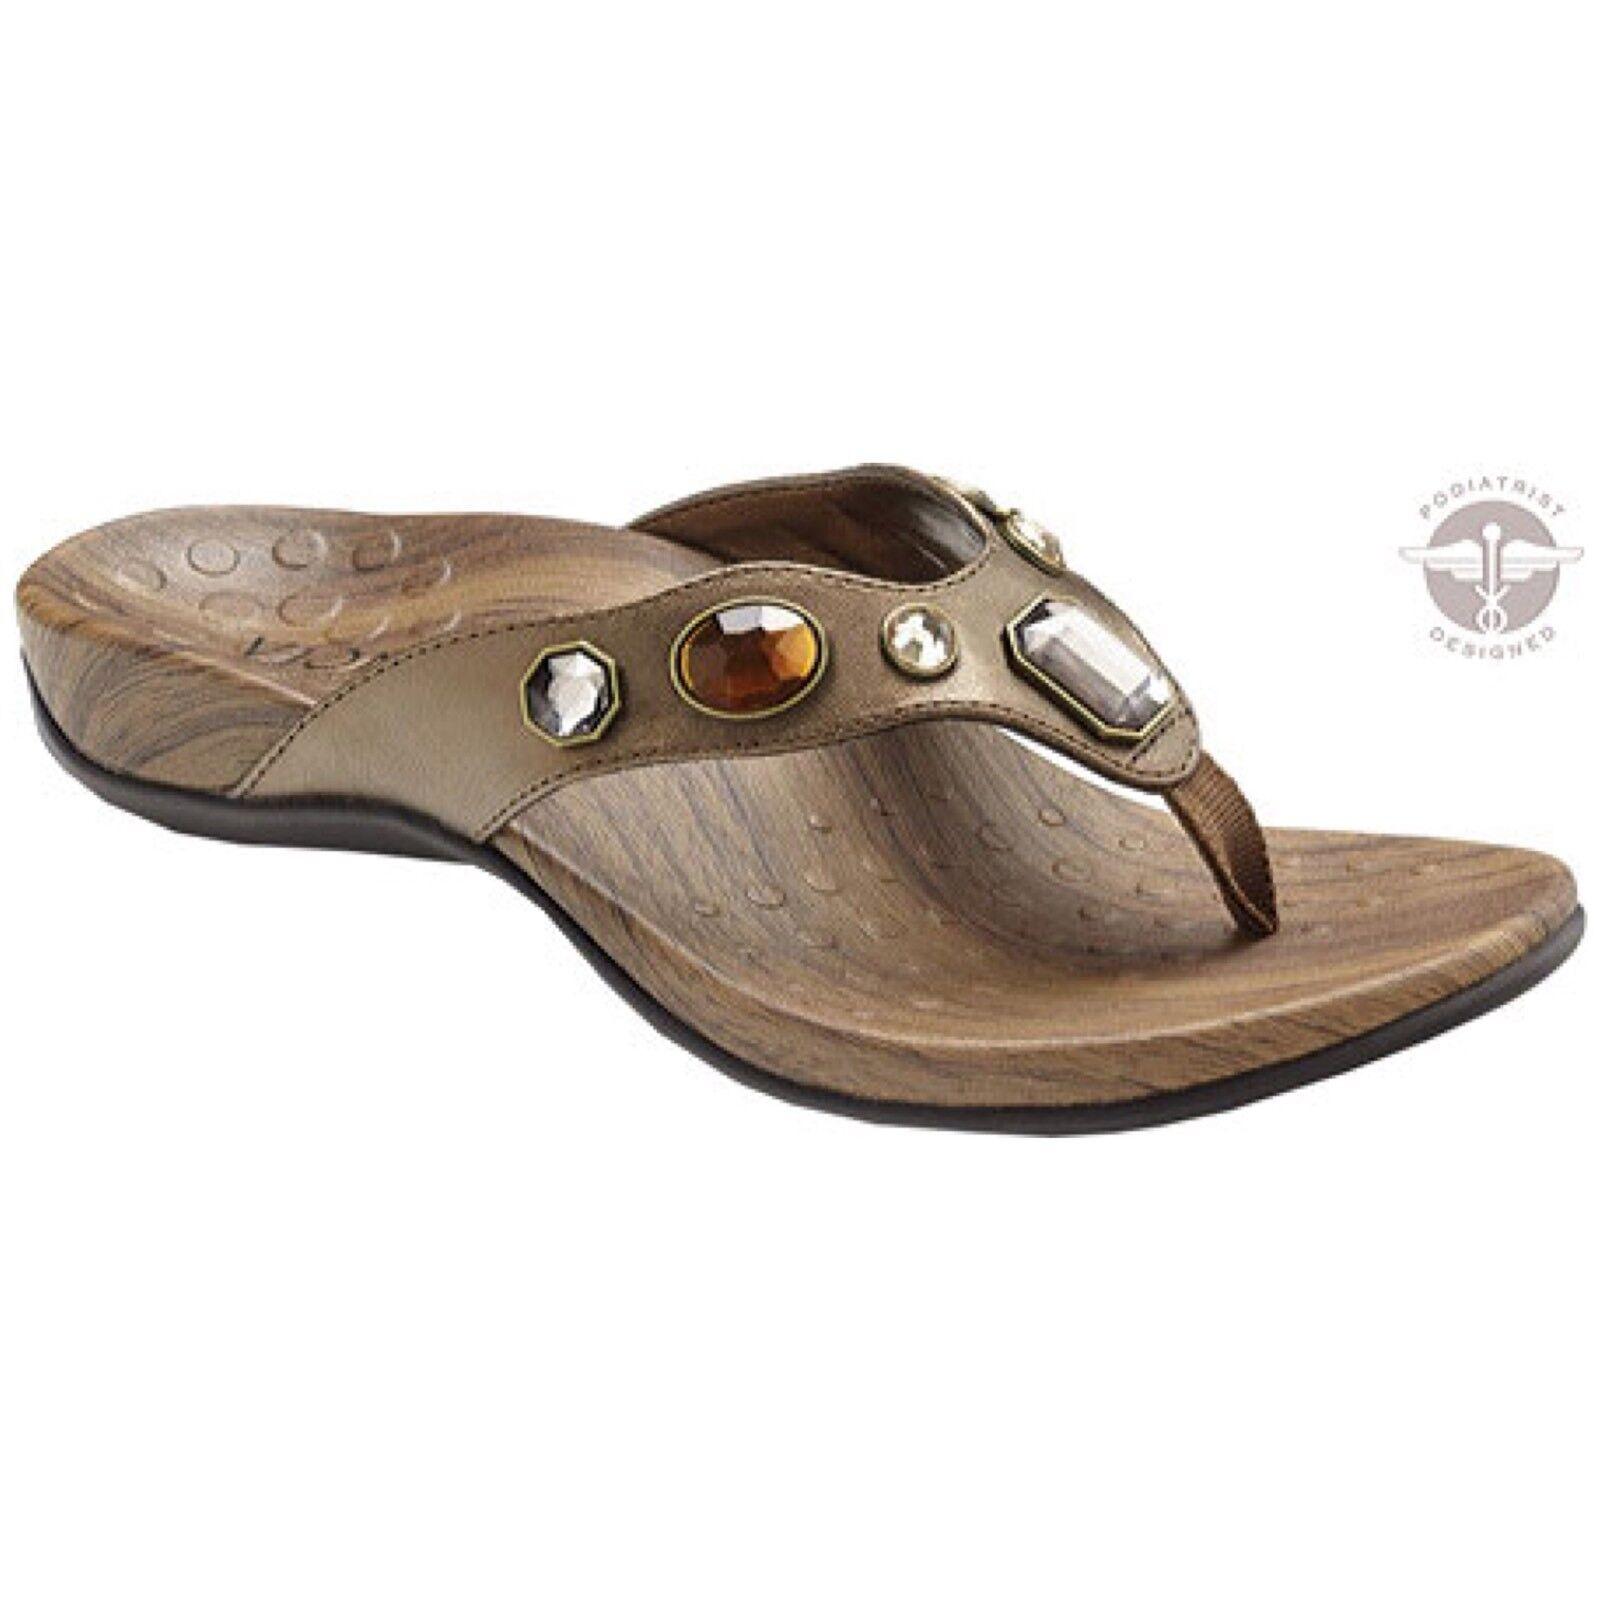 NEW Vionic Eve Womens 11 42 Jewel Sandals Bronze Faux Faux Faux Leather Orthoheel Vegan 1eeca8